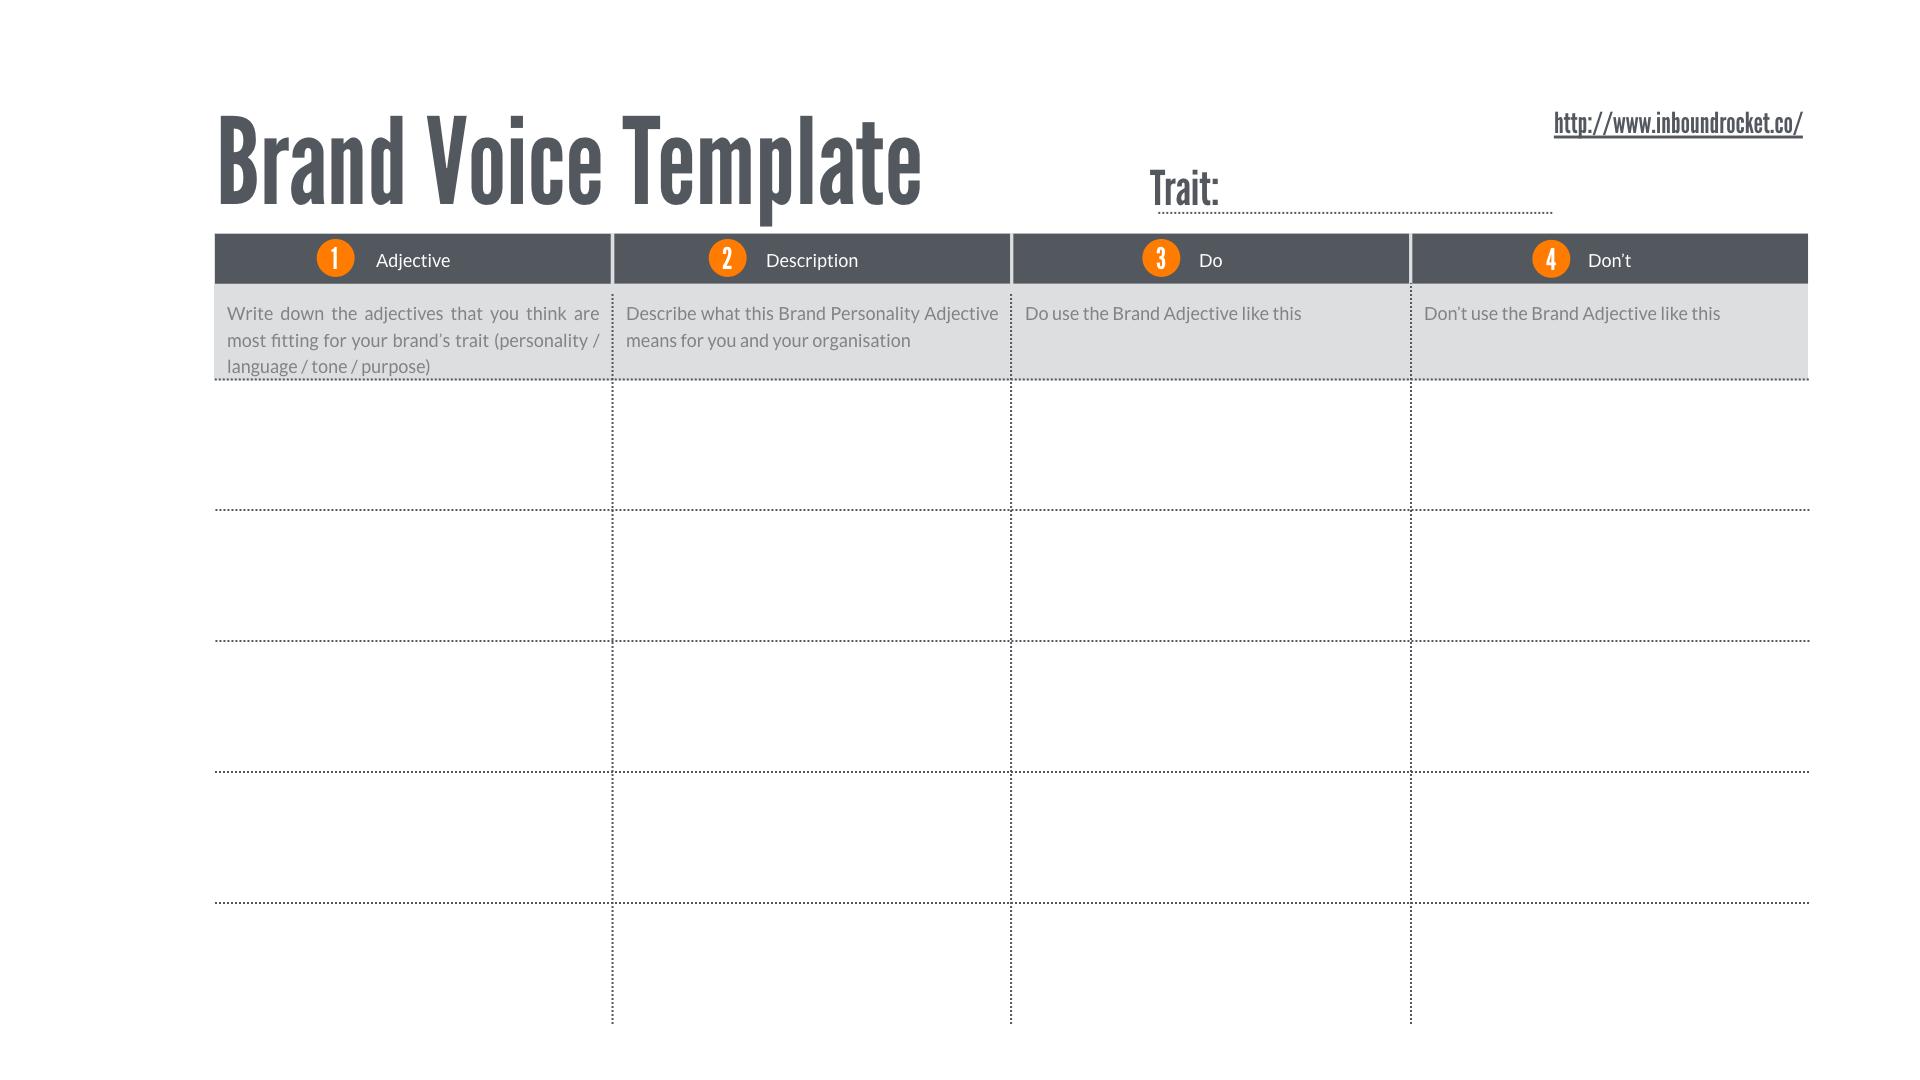 Brand Voice Template